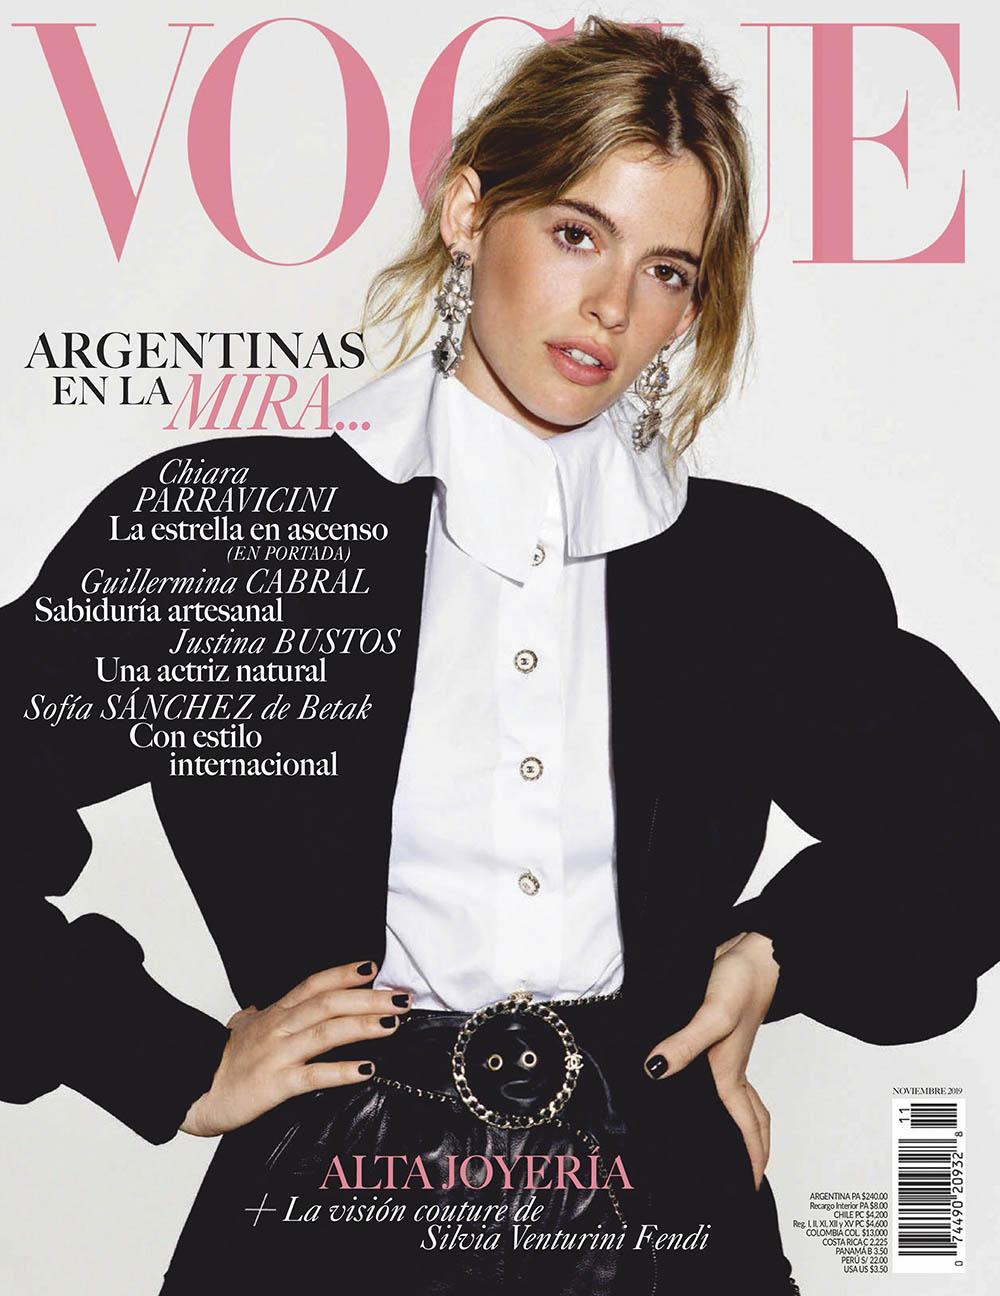 Chiara Parravicini covers Vogue Latin America November 2019 by David Ferrua